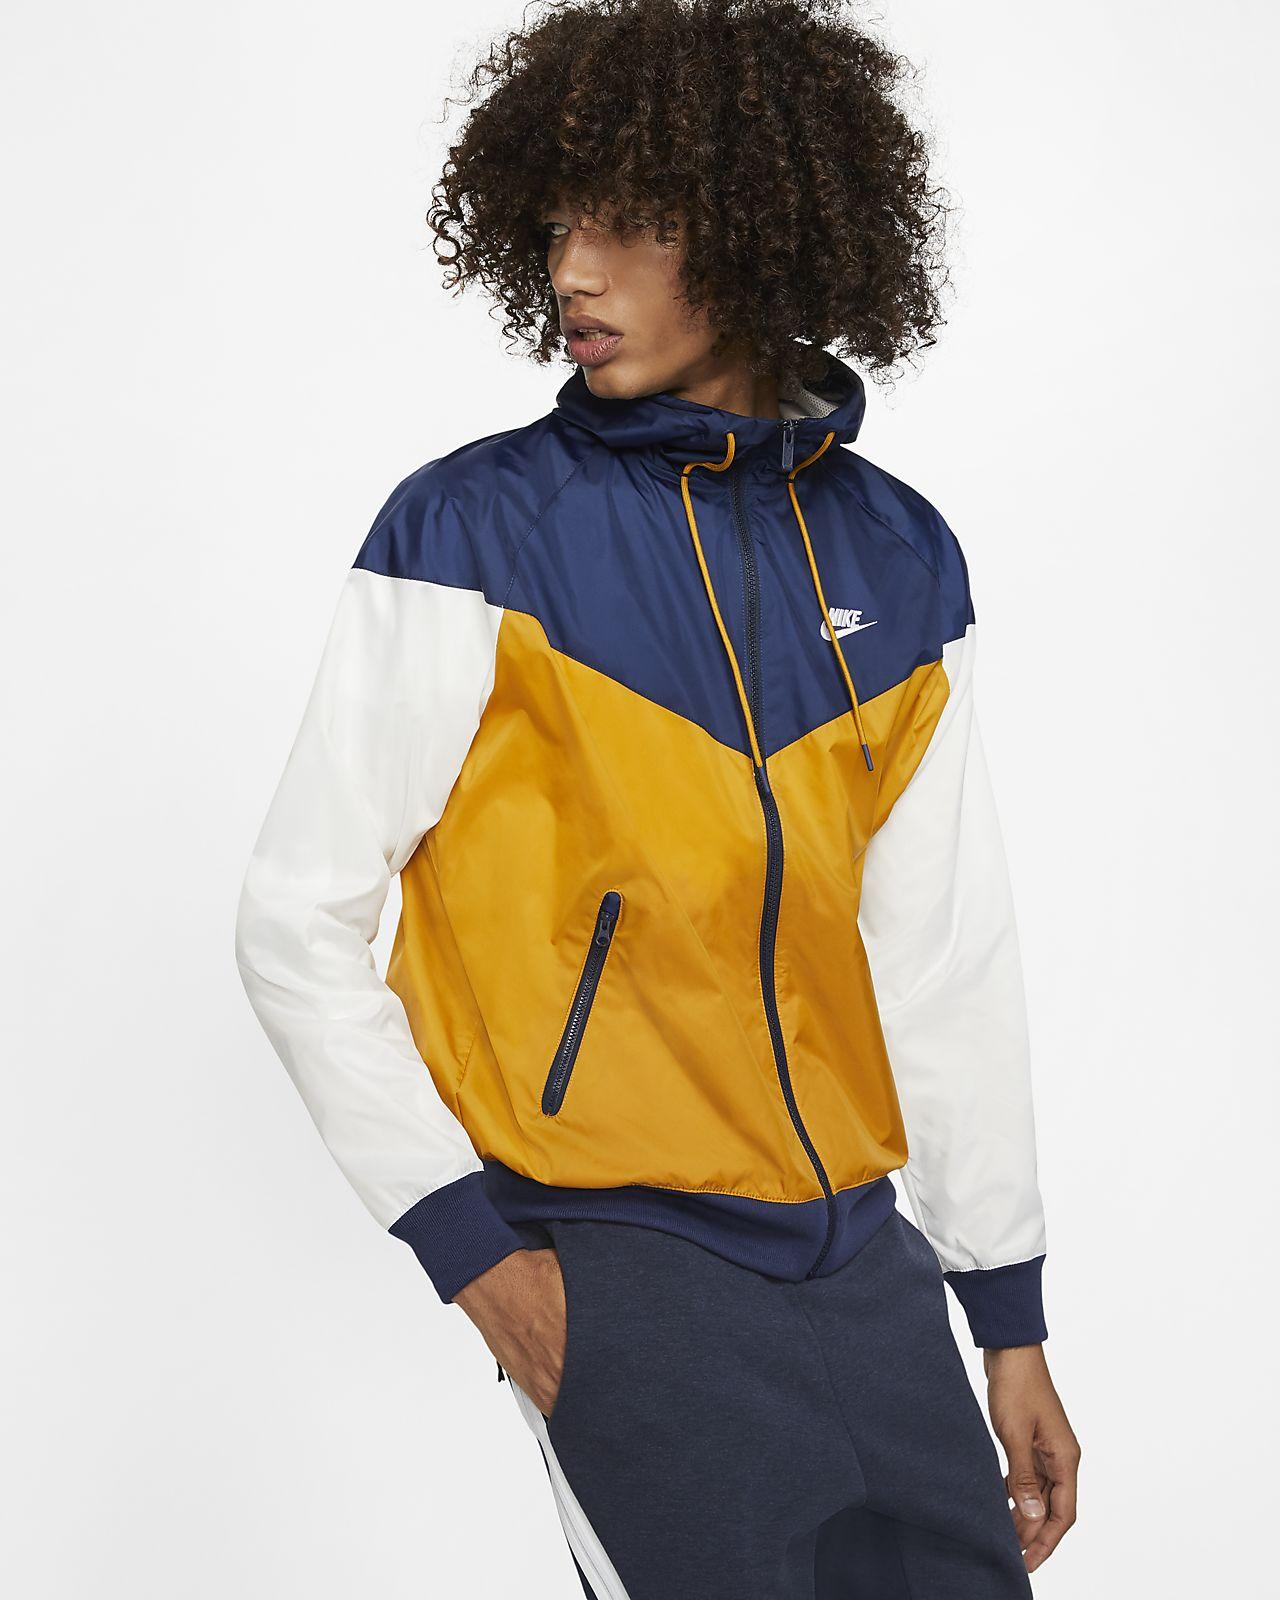 authorized site to buy huge discount Nike Sportswear Windrunner Herren-Windbreaker mit Kapuze